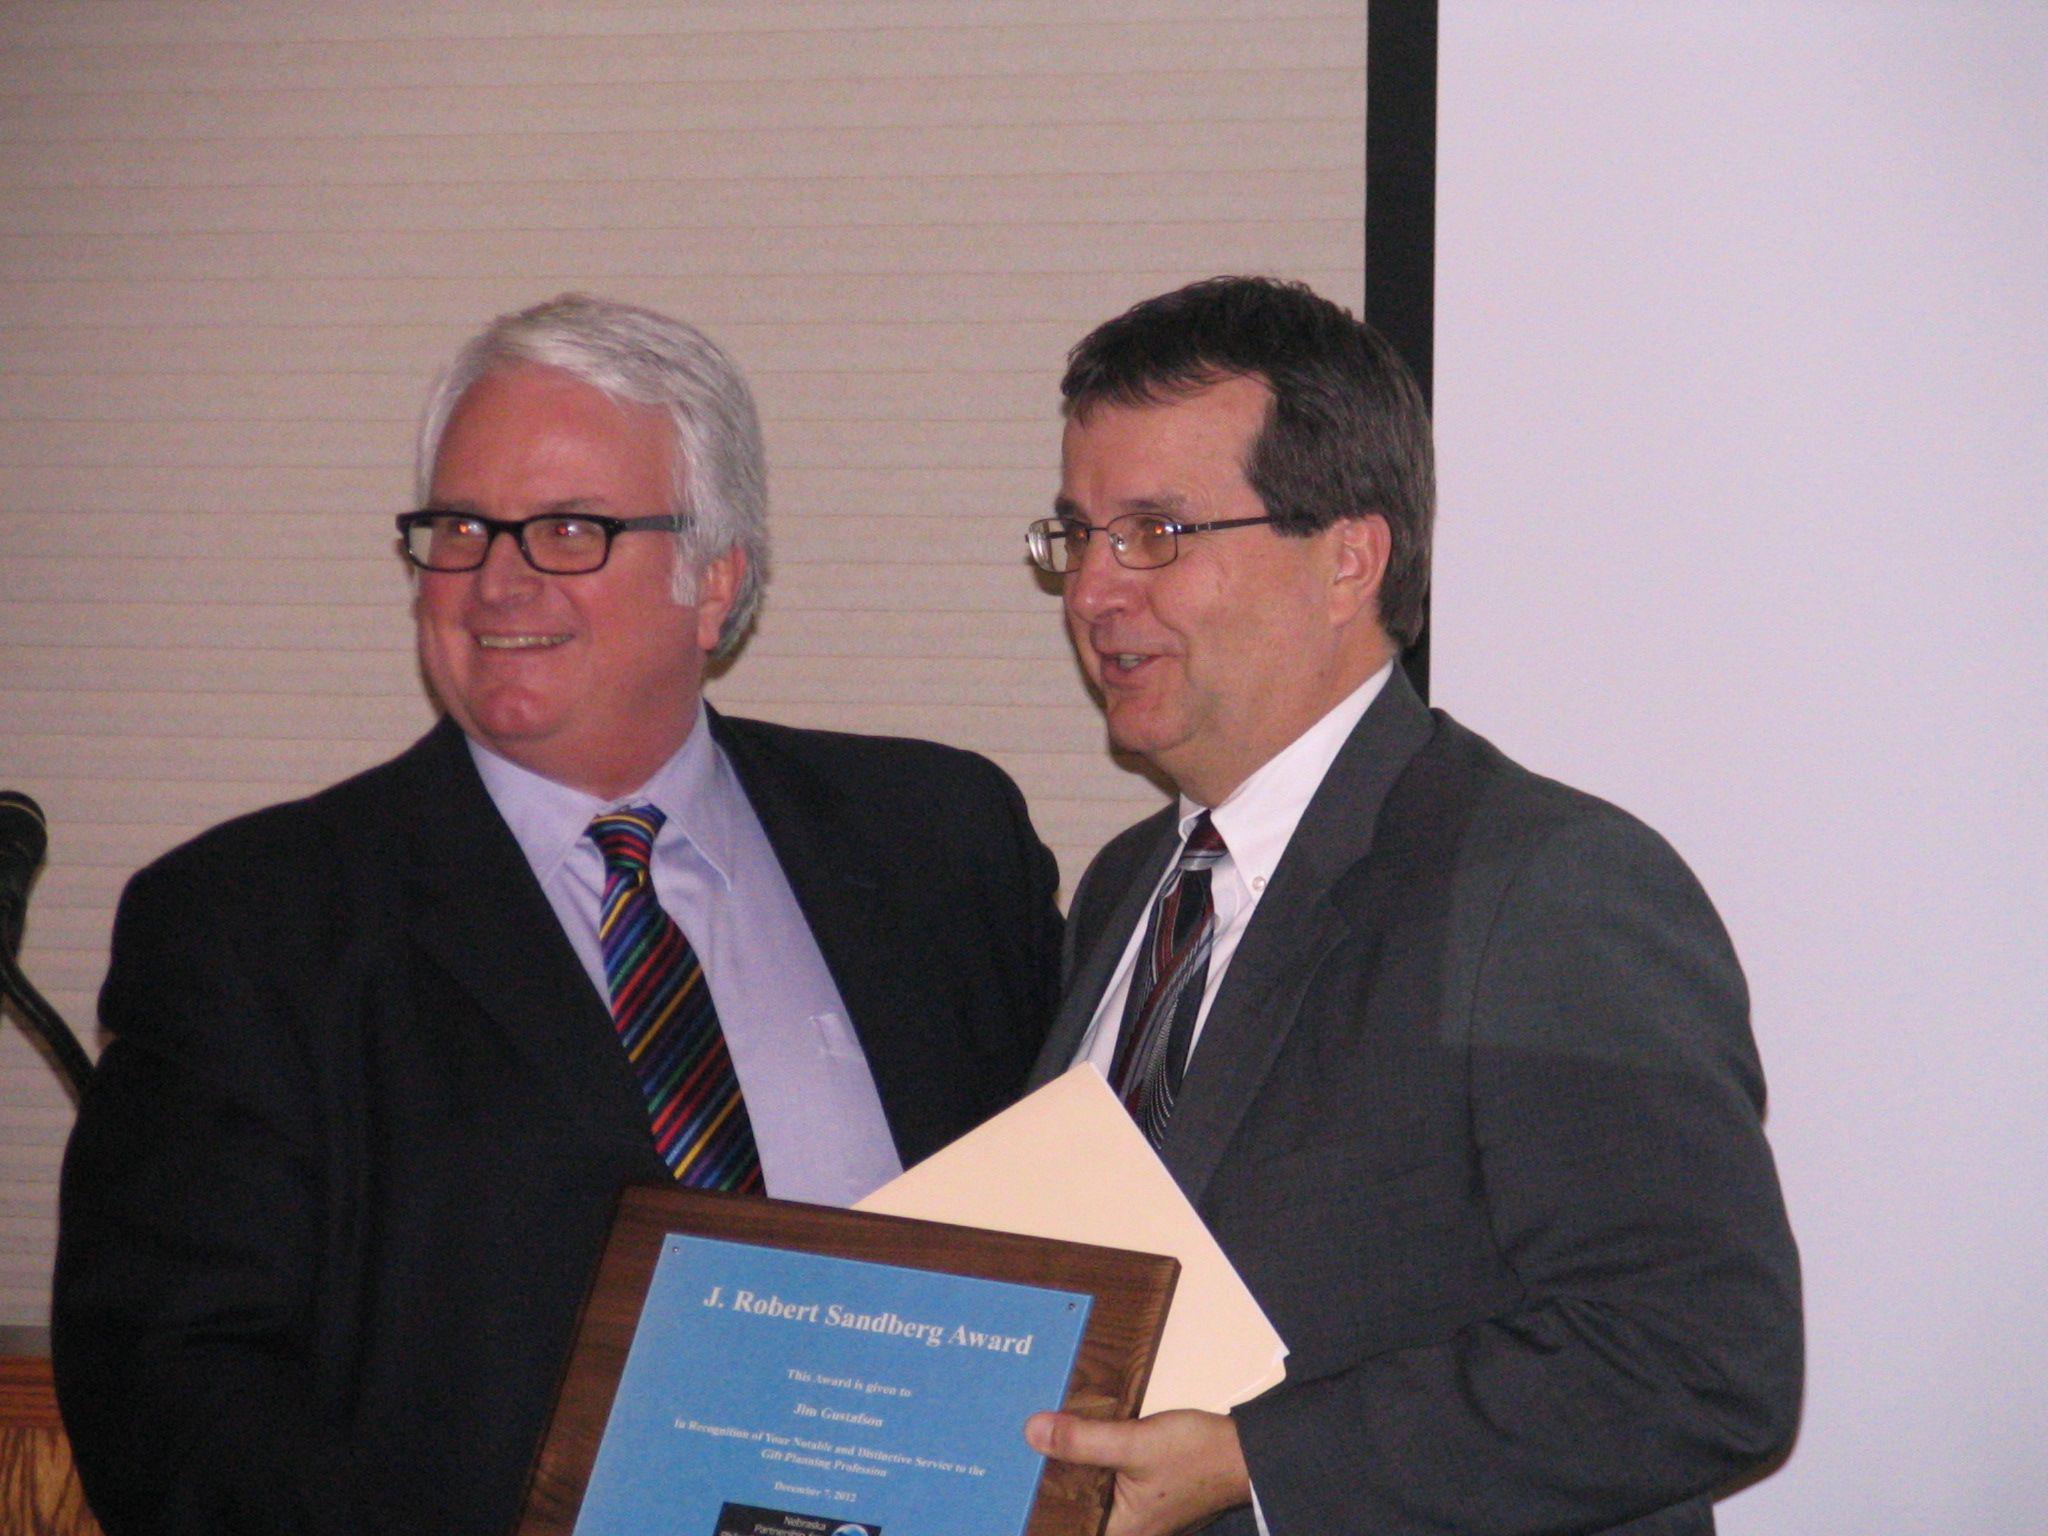 2012 Sandberg Award